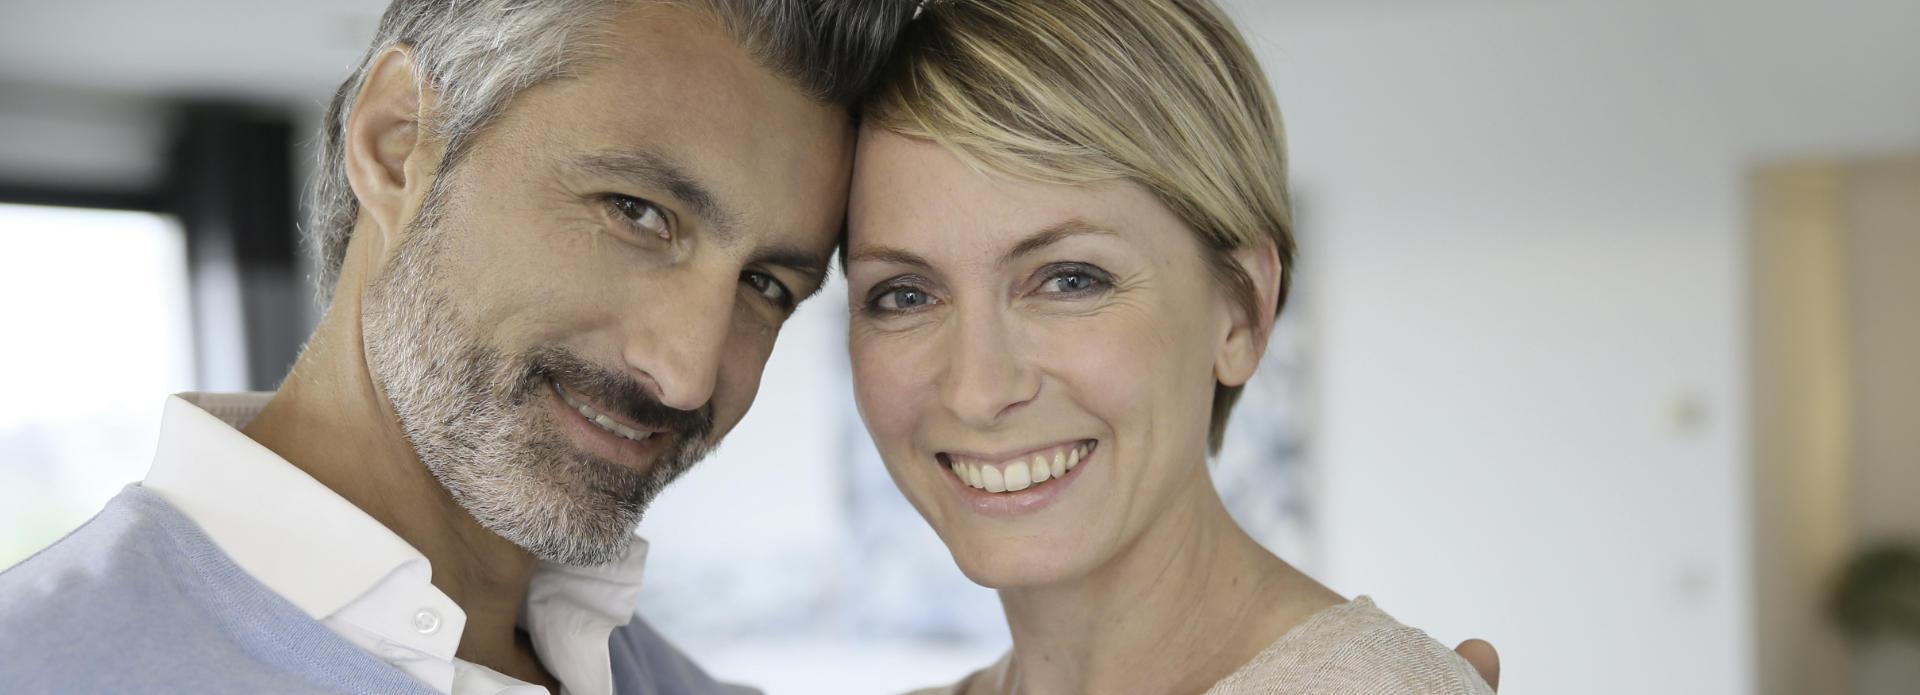 mature smiling couple